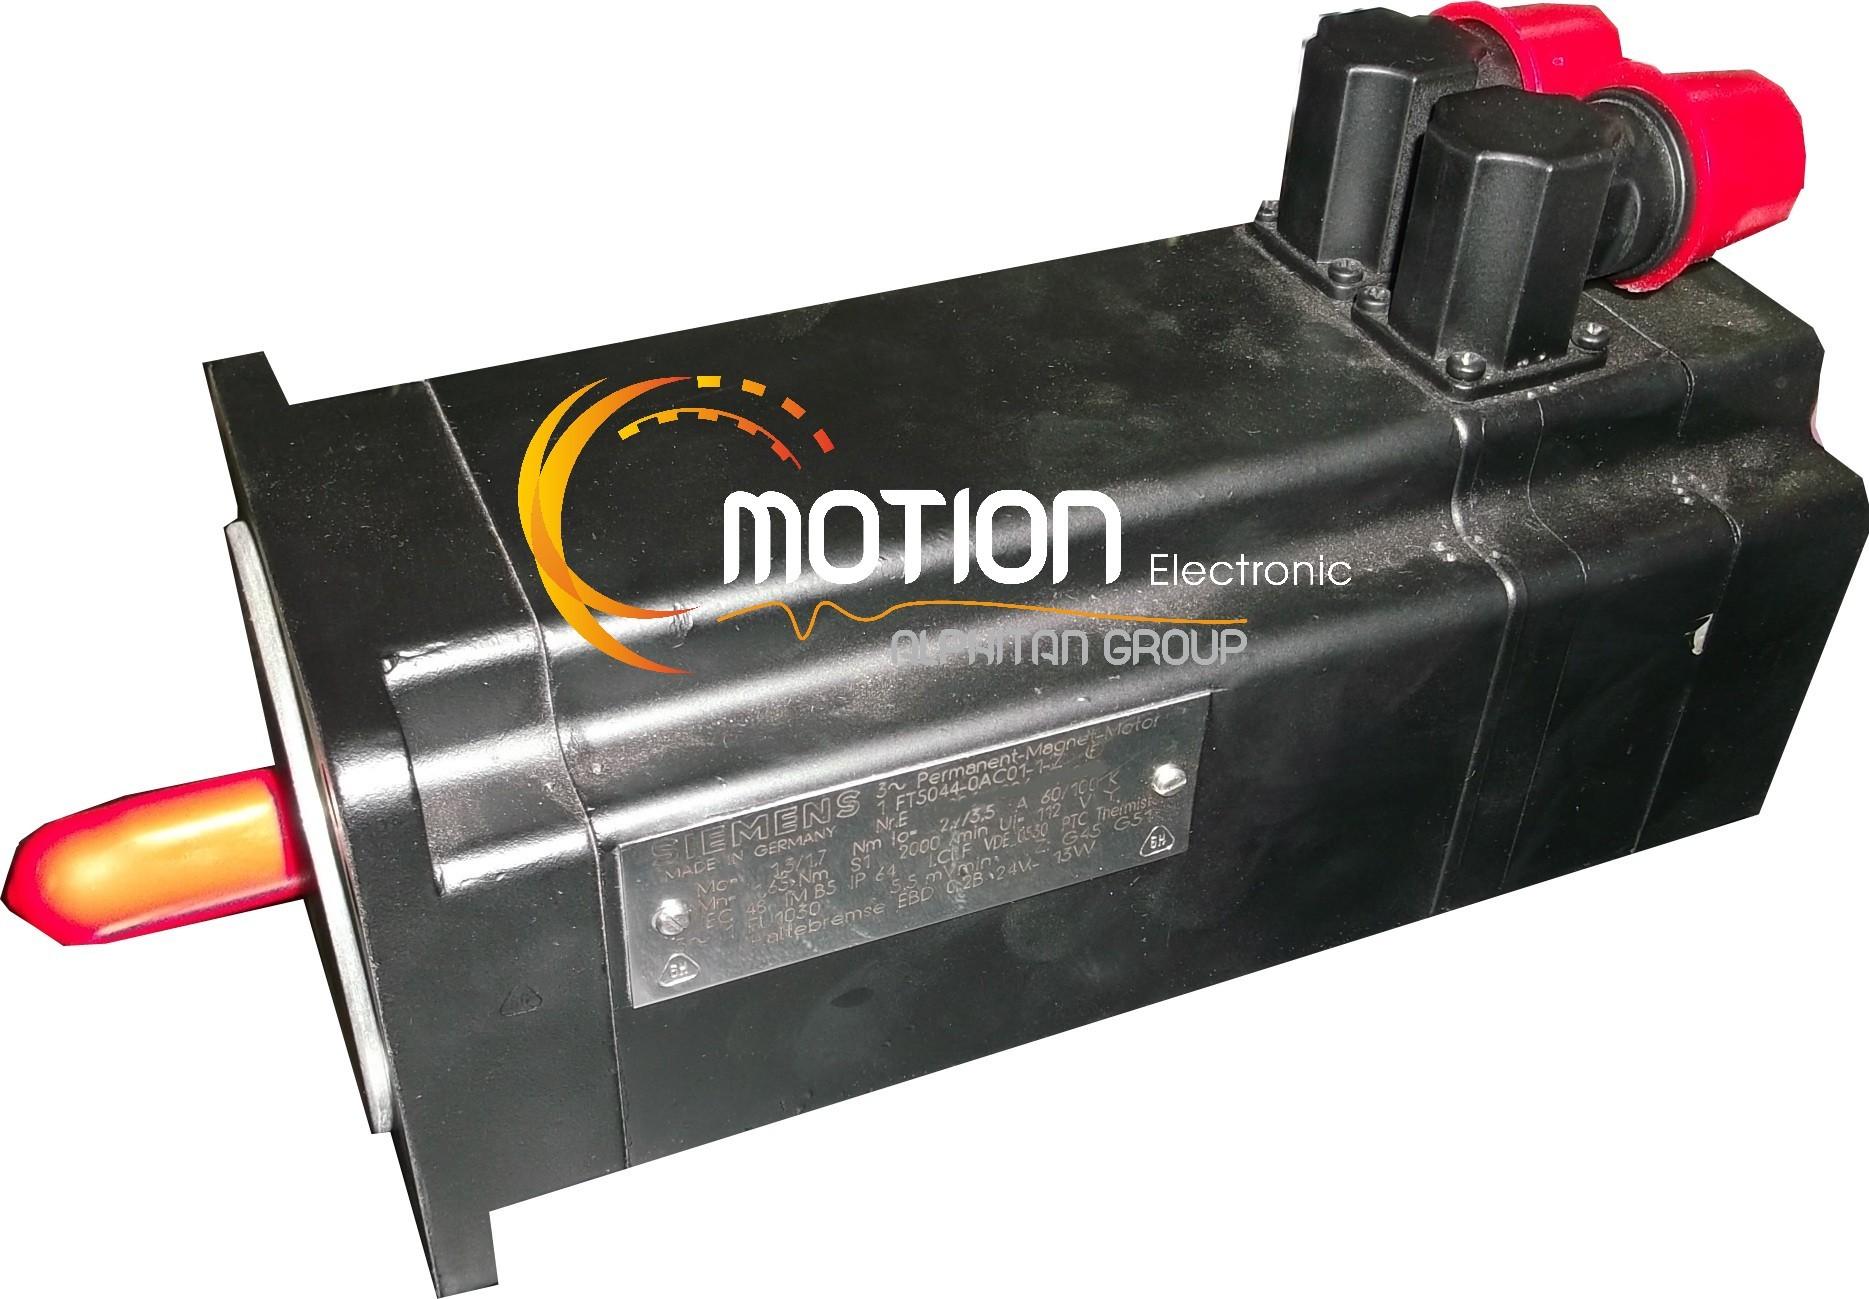 Siemens ac motors catalog pdf brinhatchwer mp3 for Siemens electric motors catalog